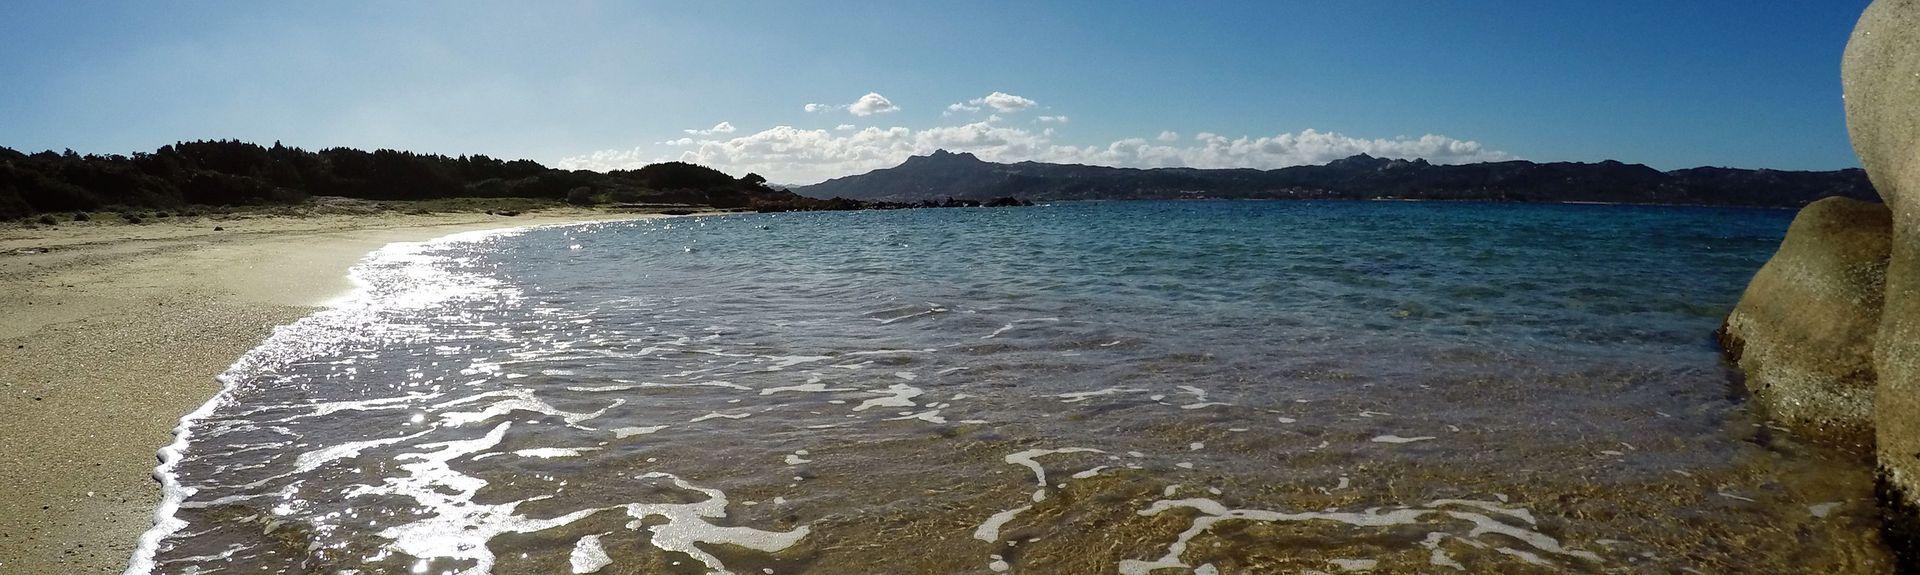 Porto di Golfo Aranci, Golfo Aranci, Sardegna, Italia